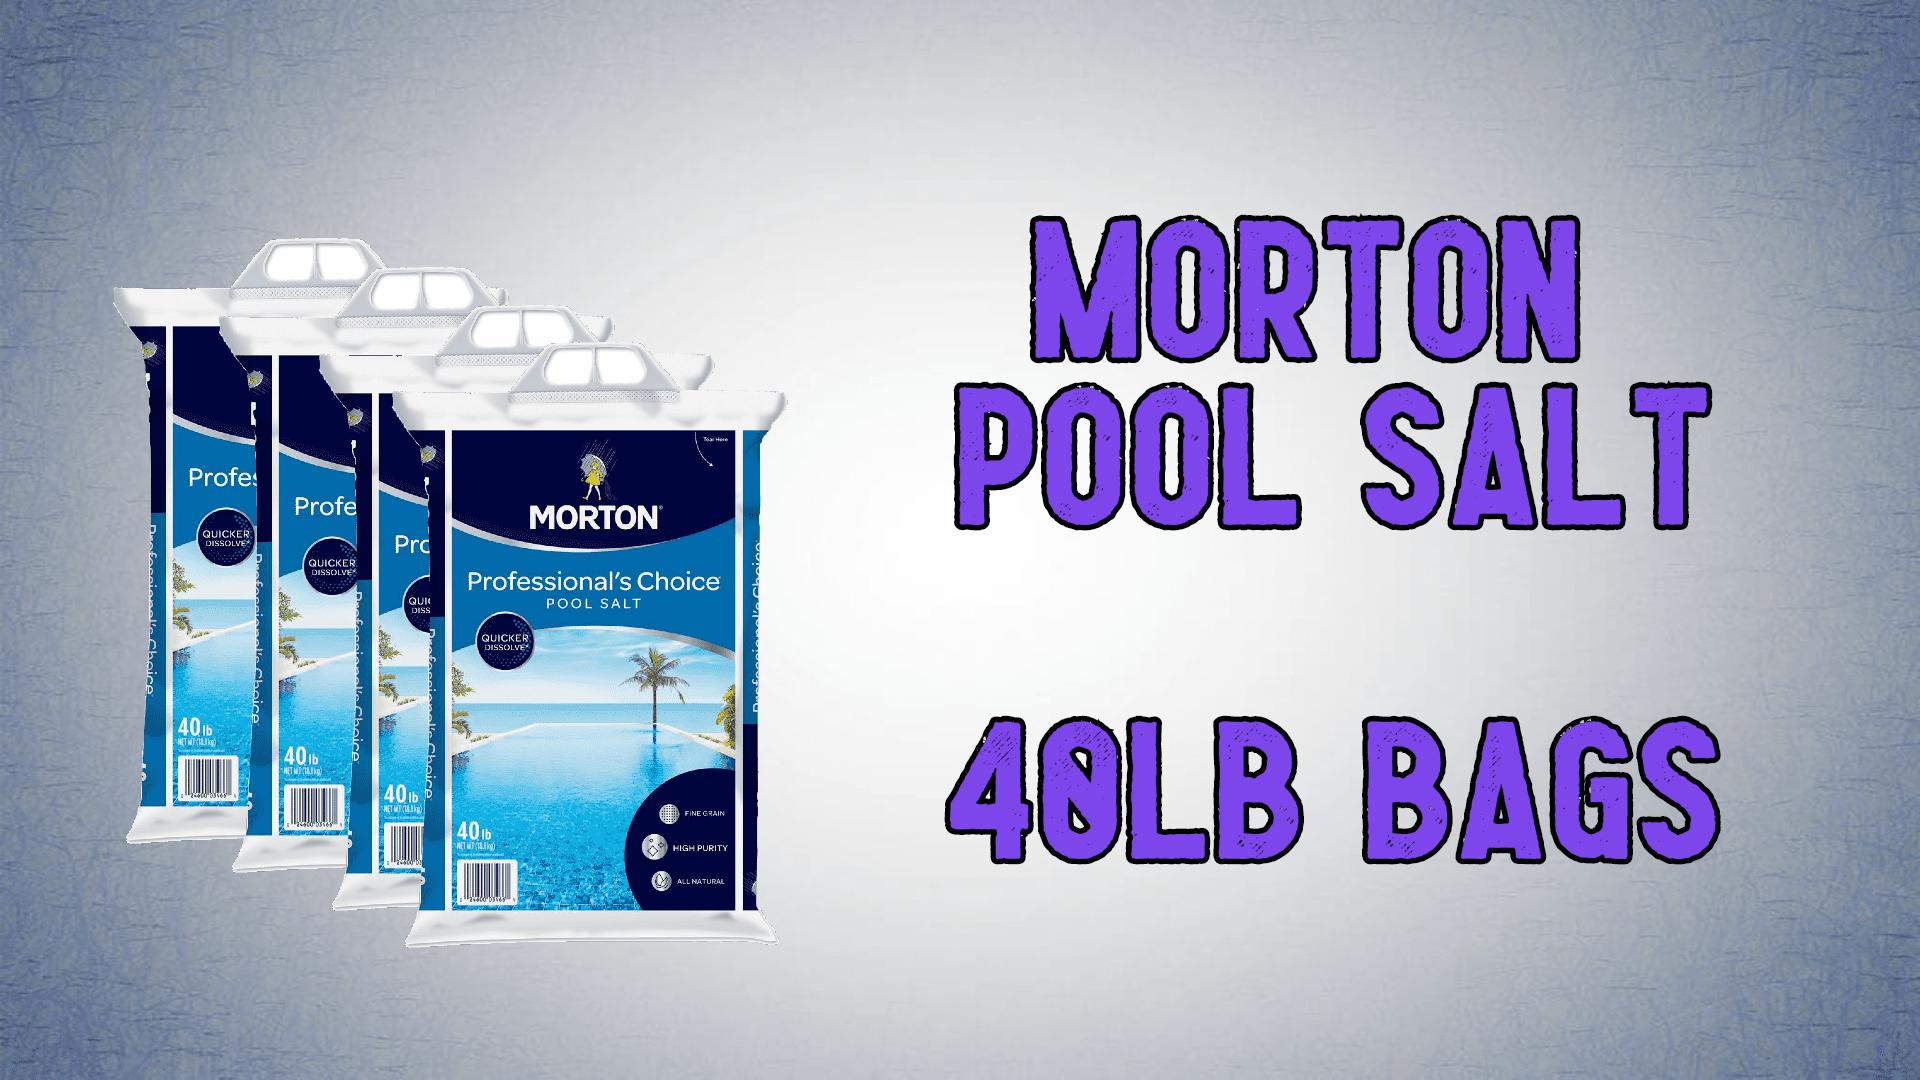 MortonPoolSalt